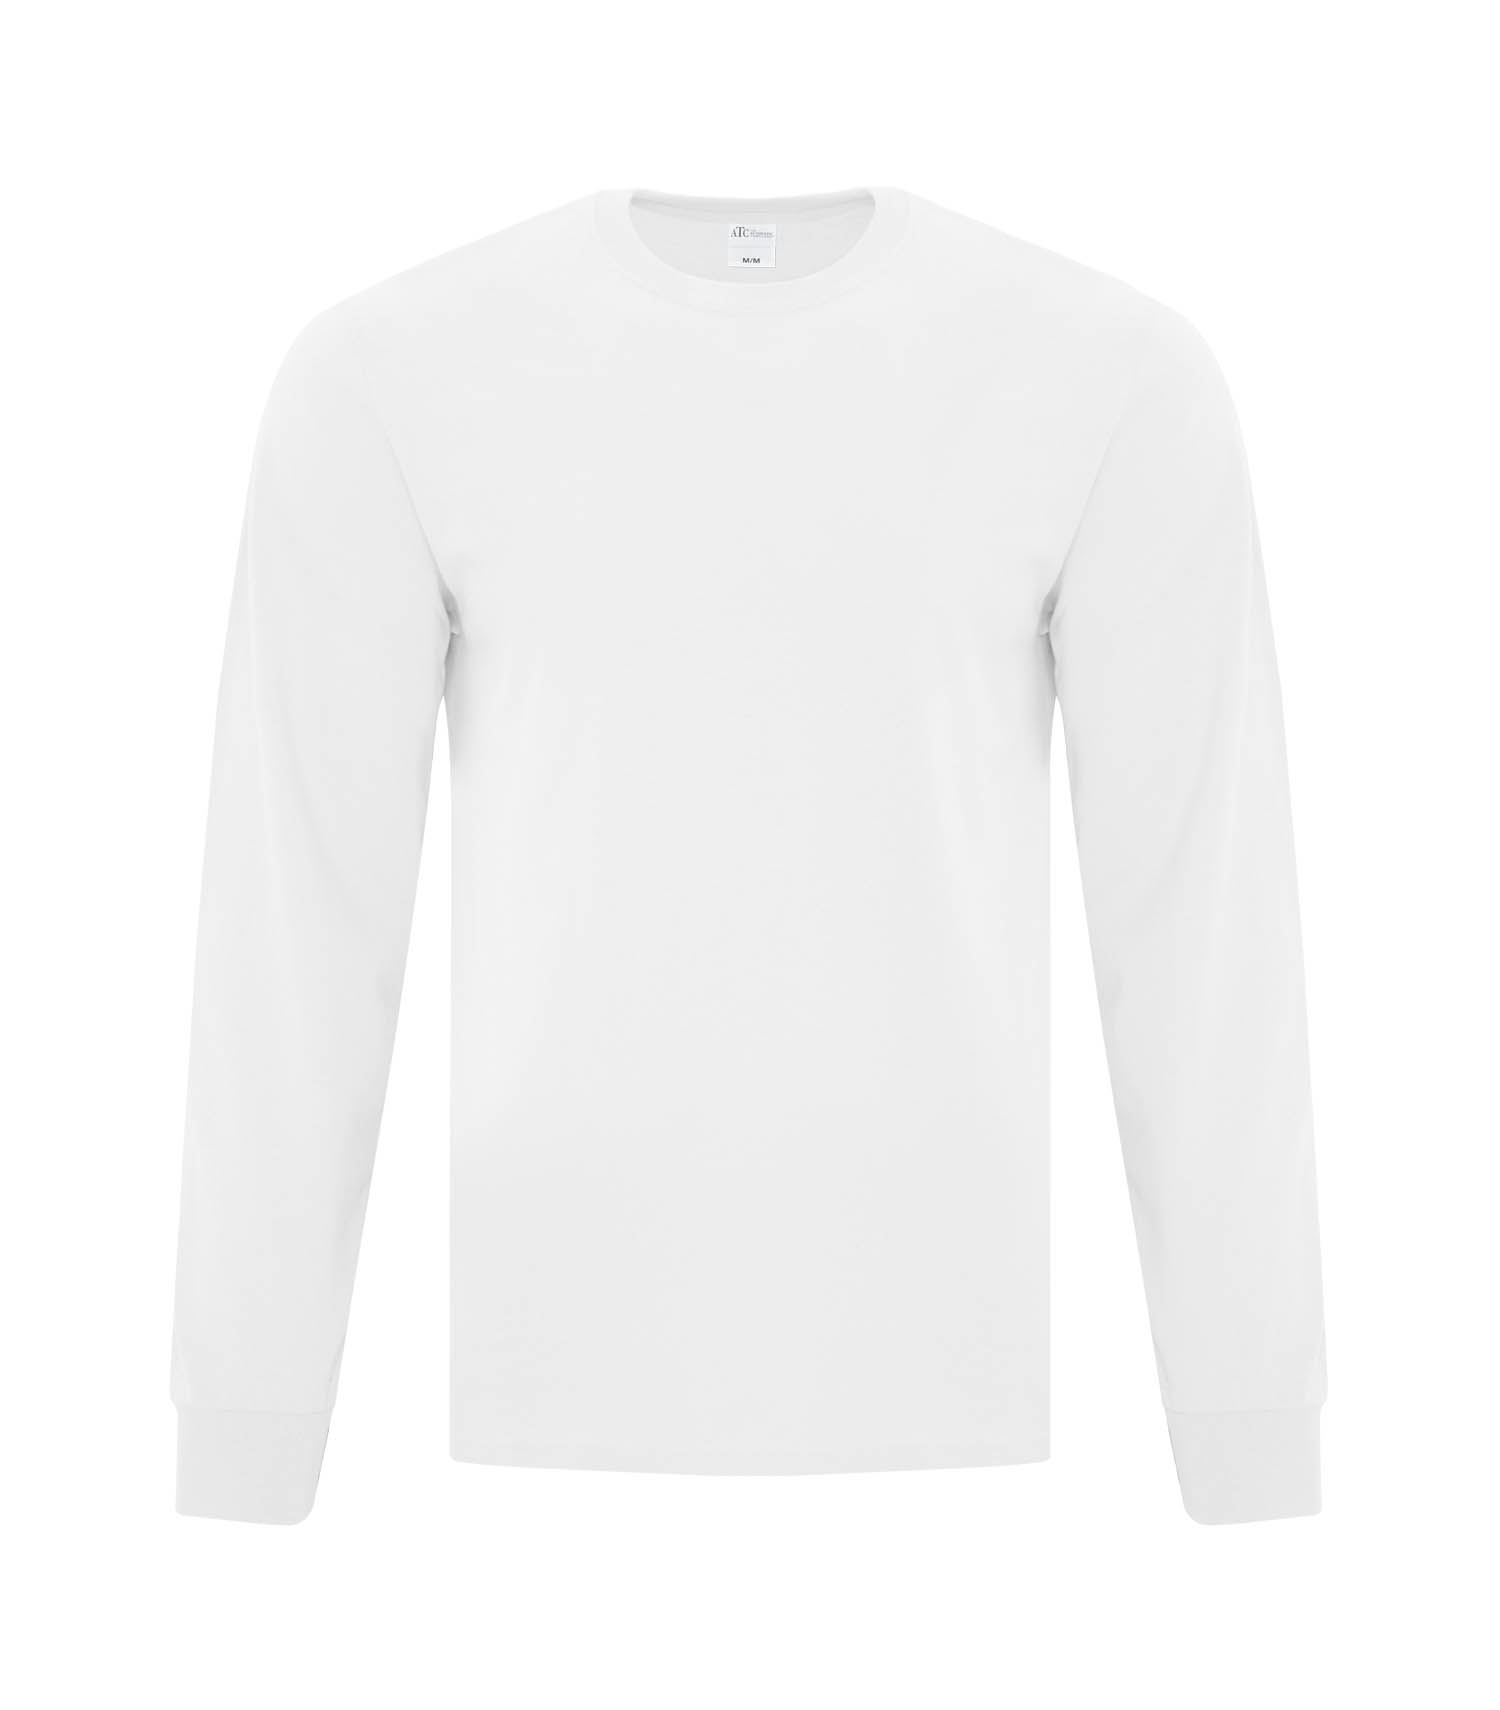 c7986183b03b Custom Printed Long Sleeve T-Shirts - Coastal Reign